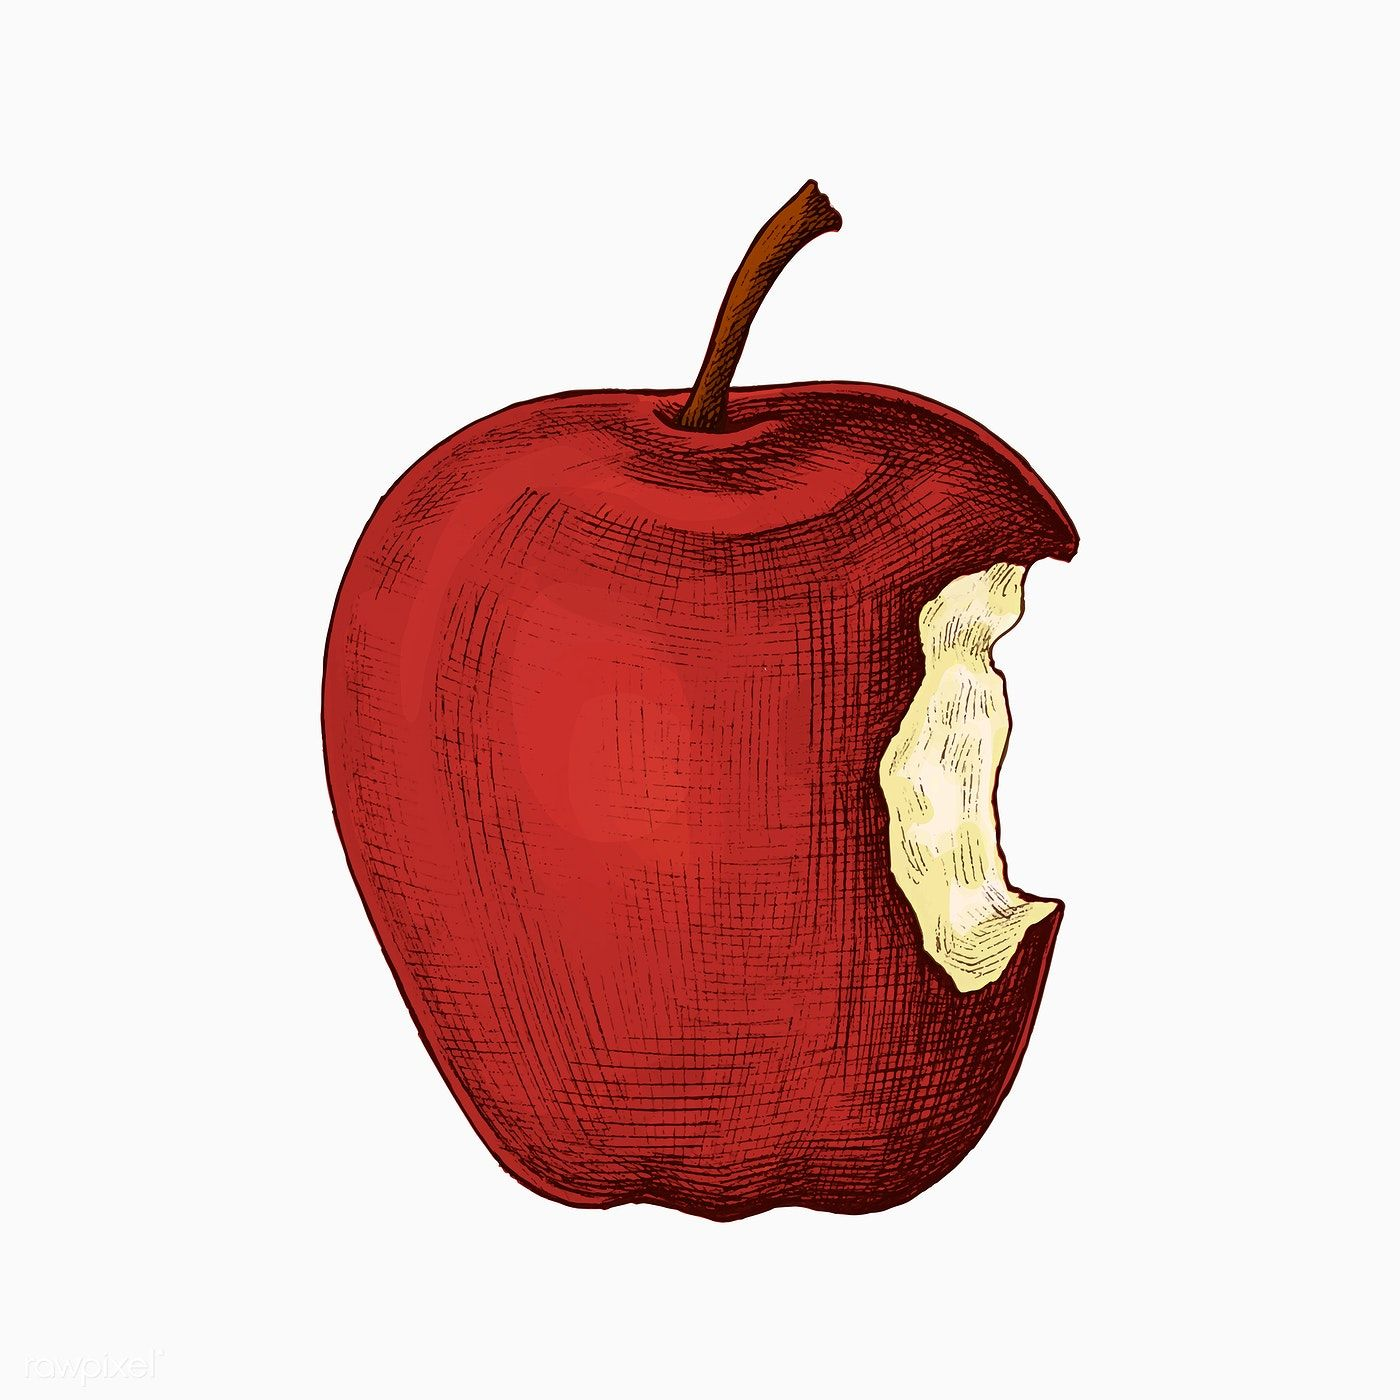 Red Ripe Bitten Apple Vector Free Image By Rawpixel Com Sasi Vector Vectorart Healthyfood Foodanddrink Foo Apple Vector Apple Illustration Vector Free